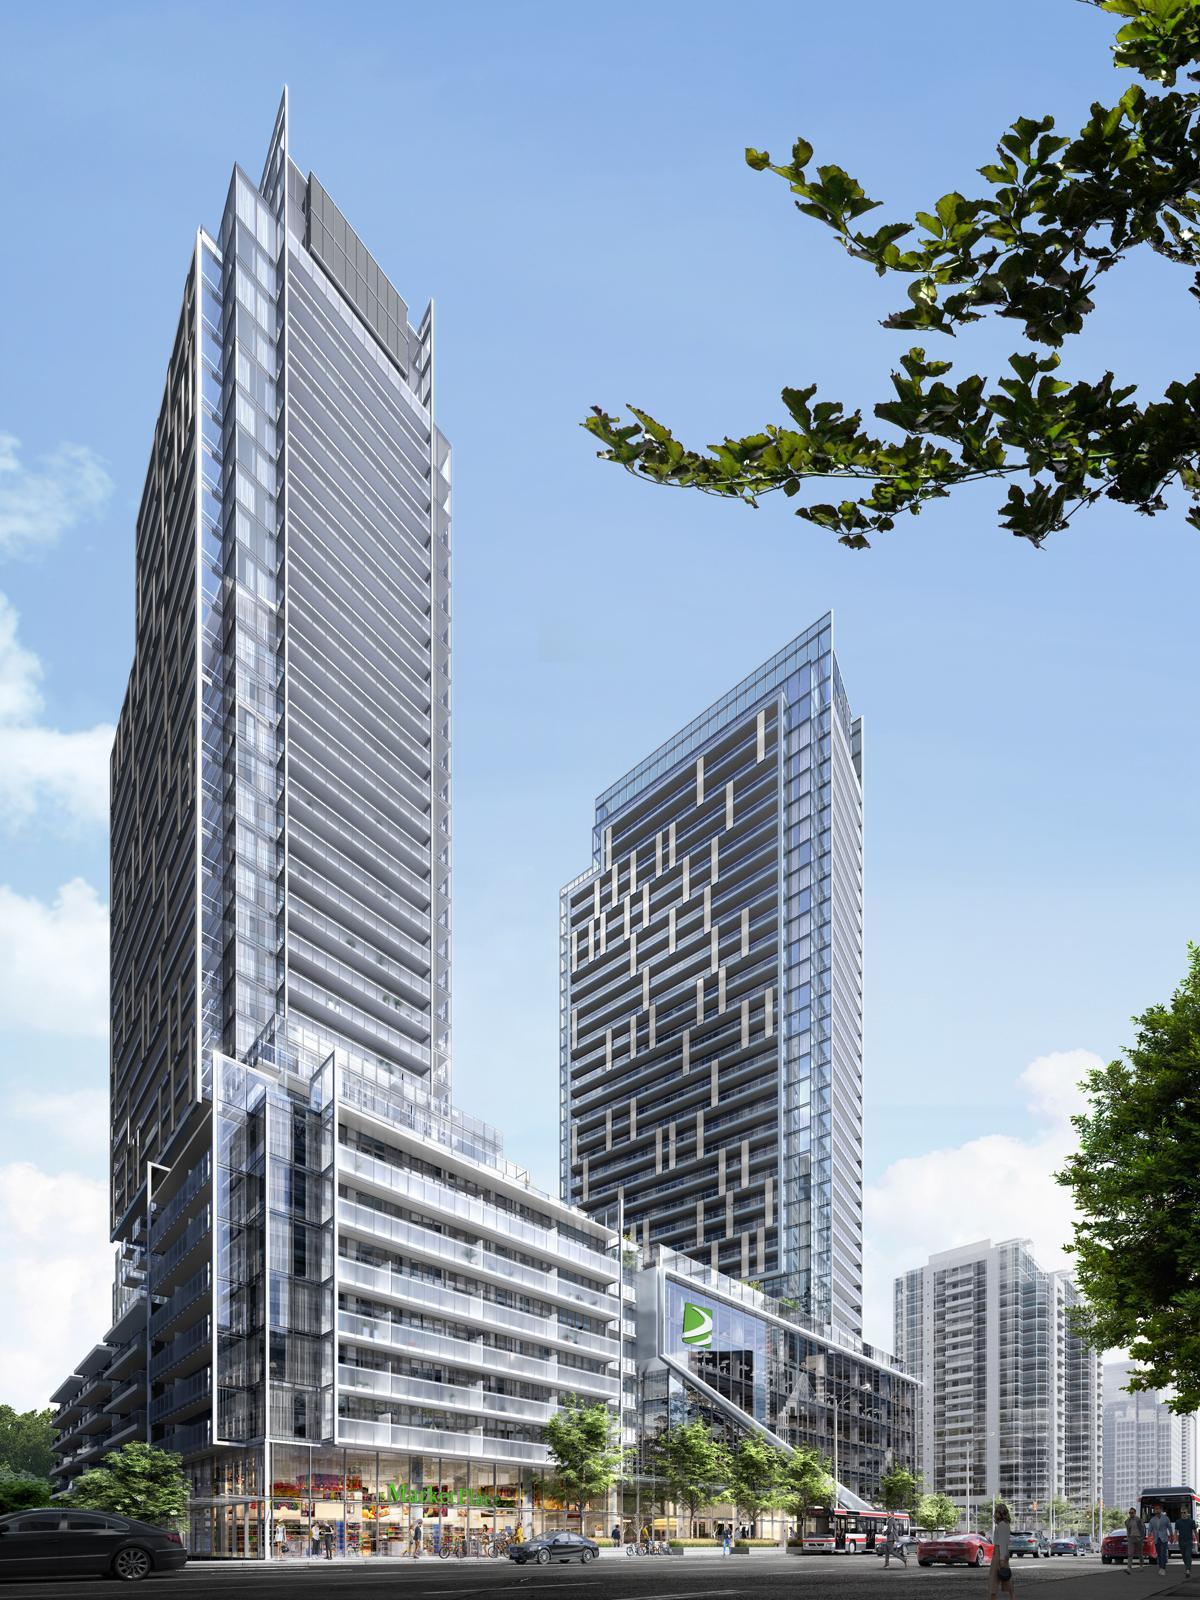 M2M Condos, Aoyuan International, Wallman Architects, Toronto